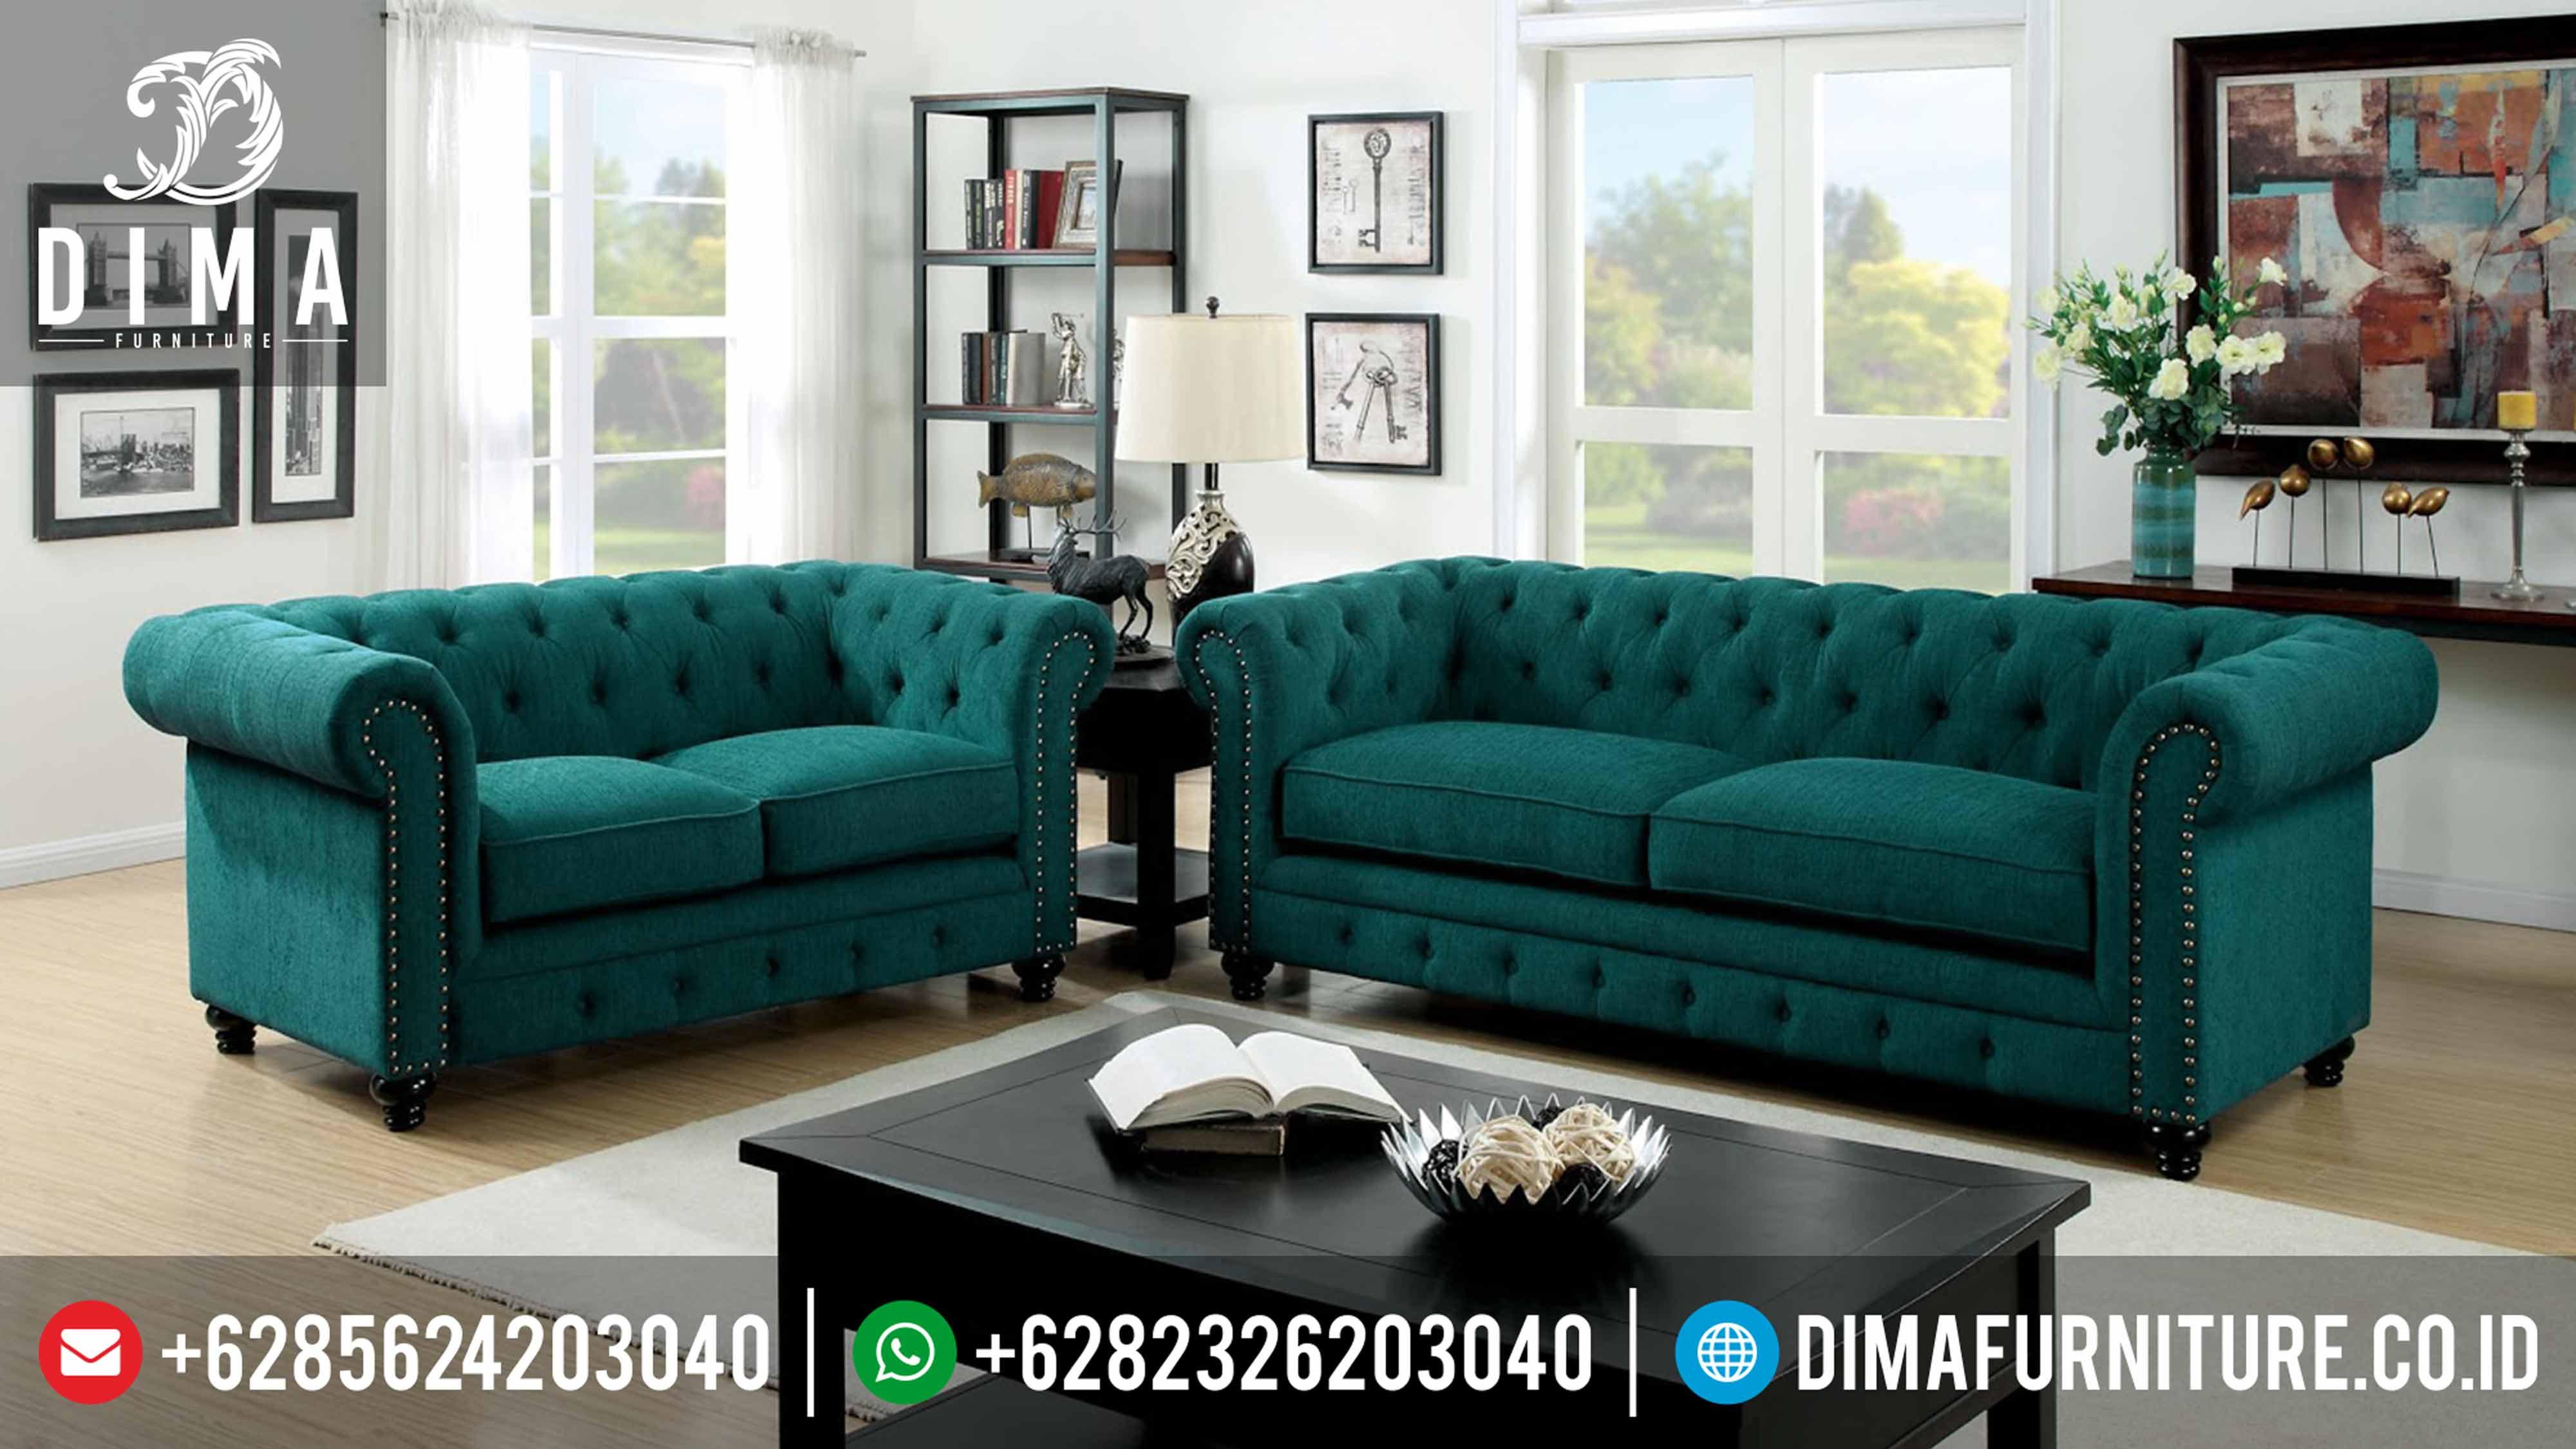 Sofa Tamu Minimalis Terbaru Vintage 2017 DF-0294